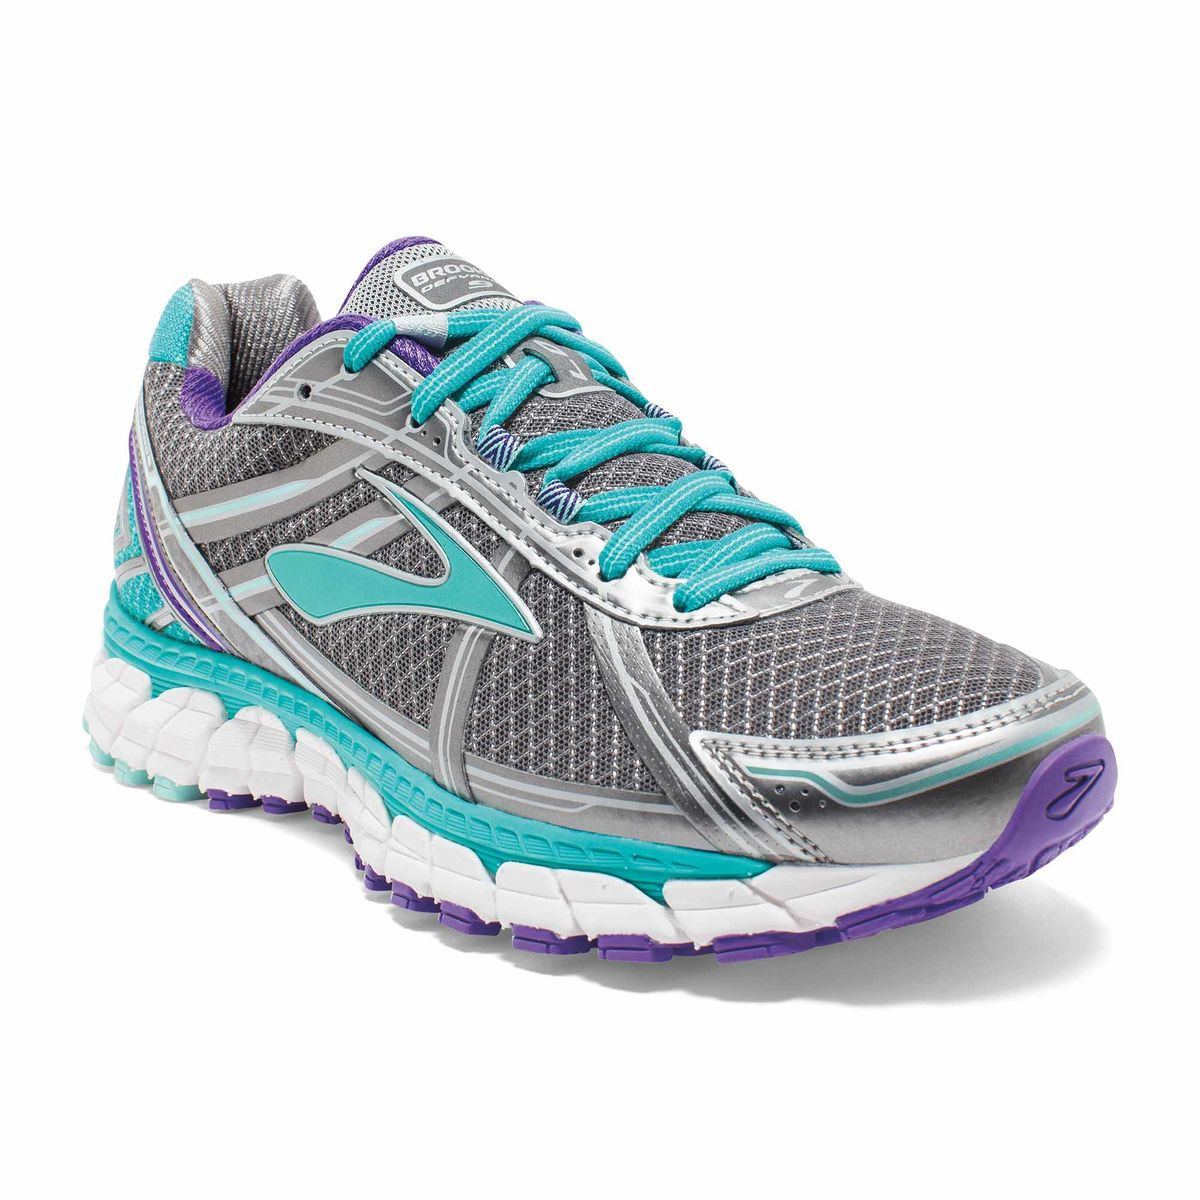 Brooks ghost running shoes women